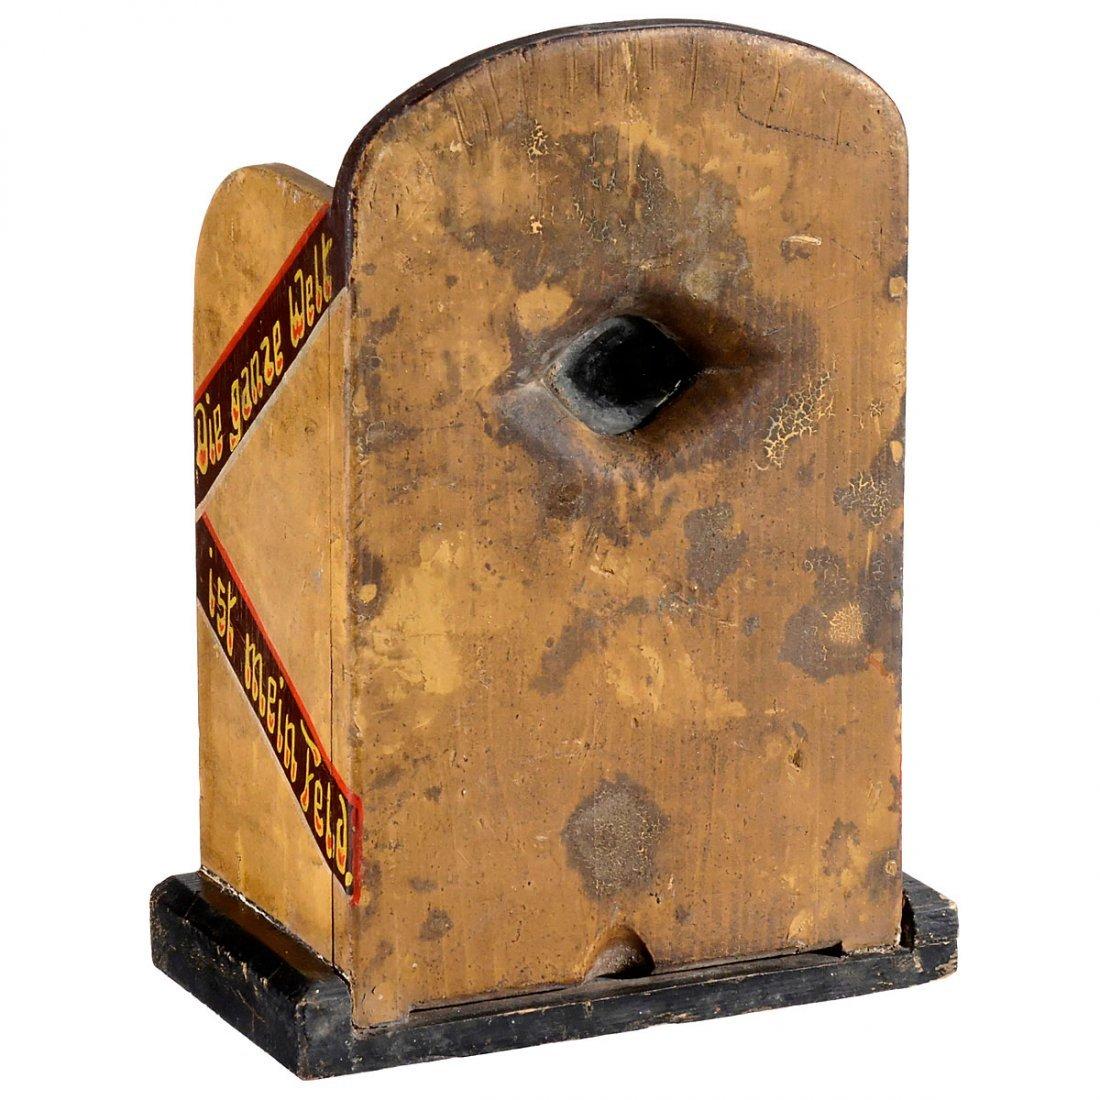 German Peep-Show Box, c. 1930